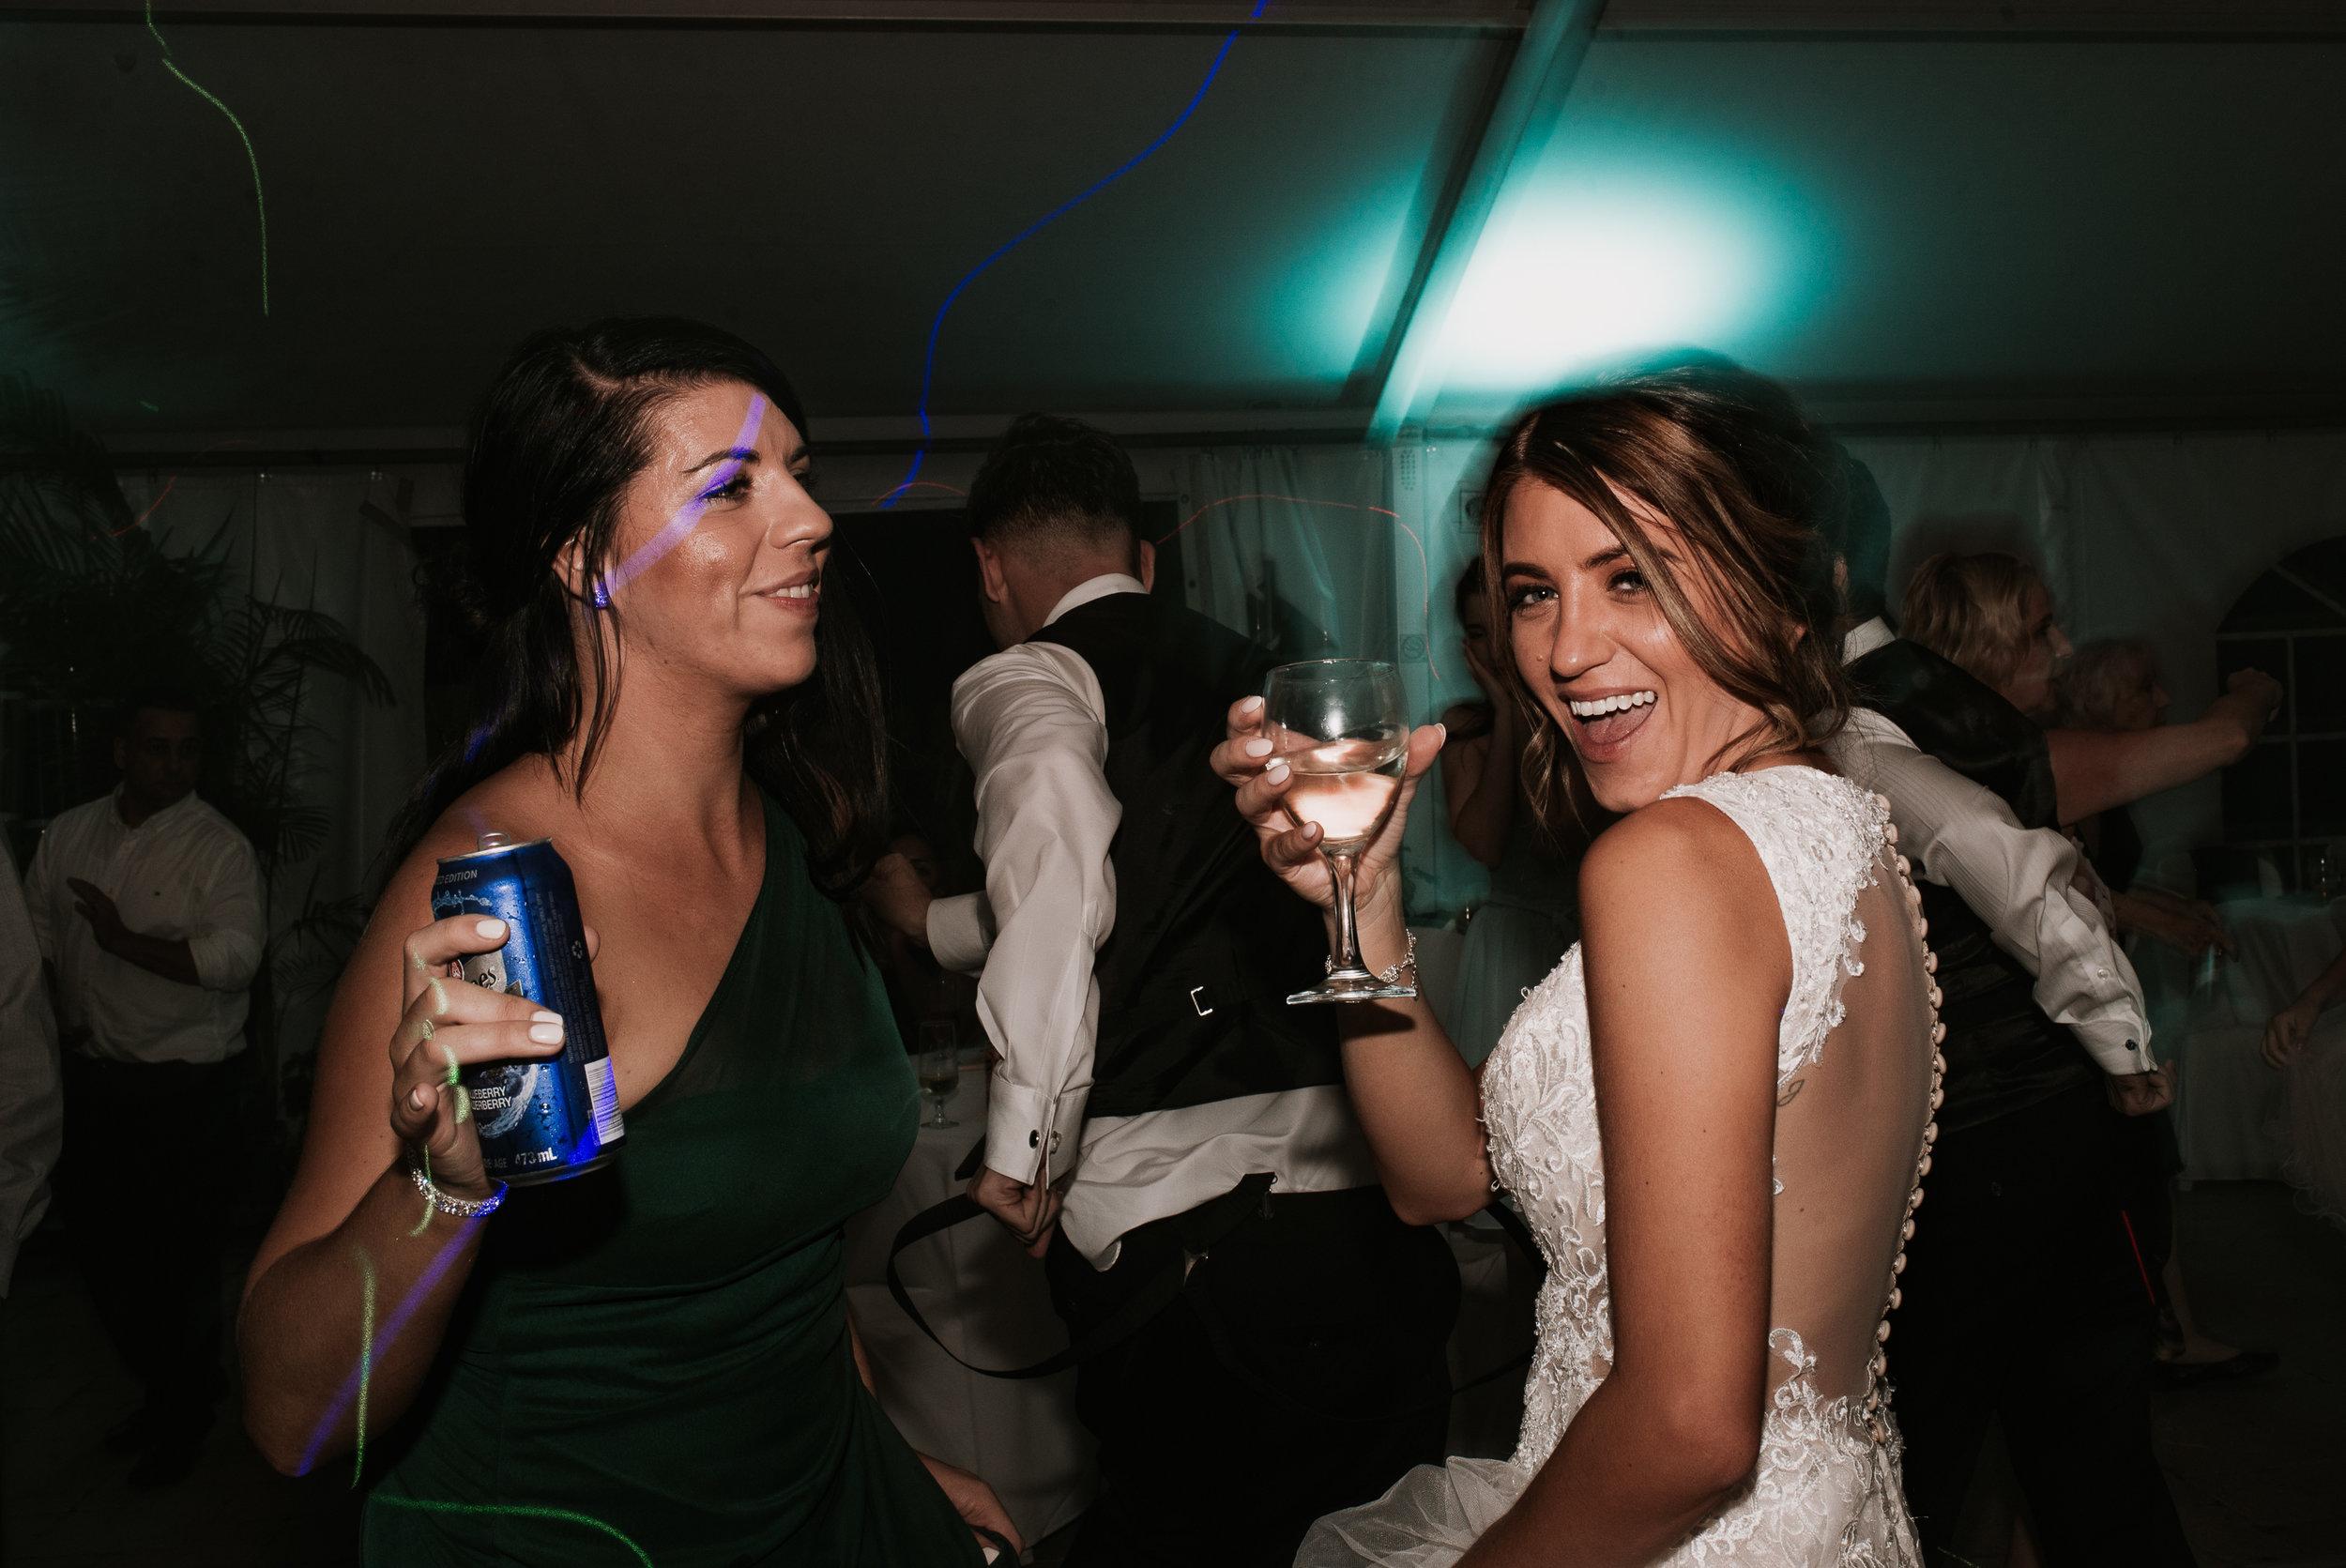 Claremont_fourseasons_Wedding-564.jpg